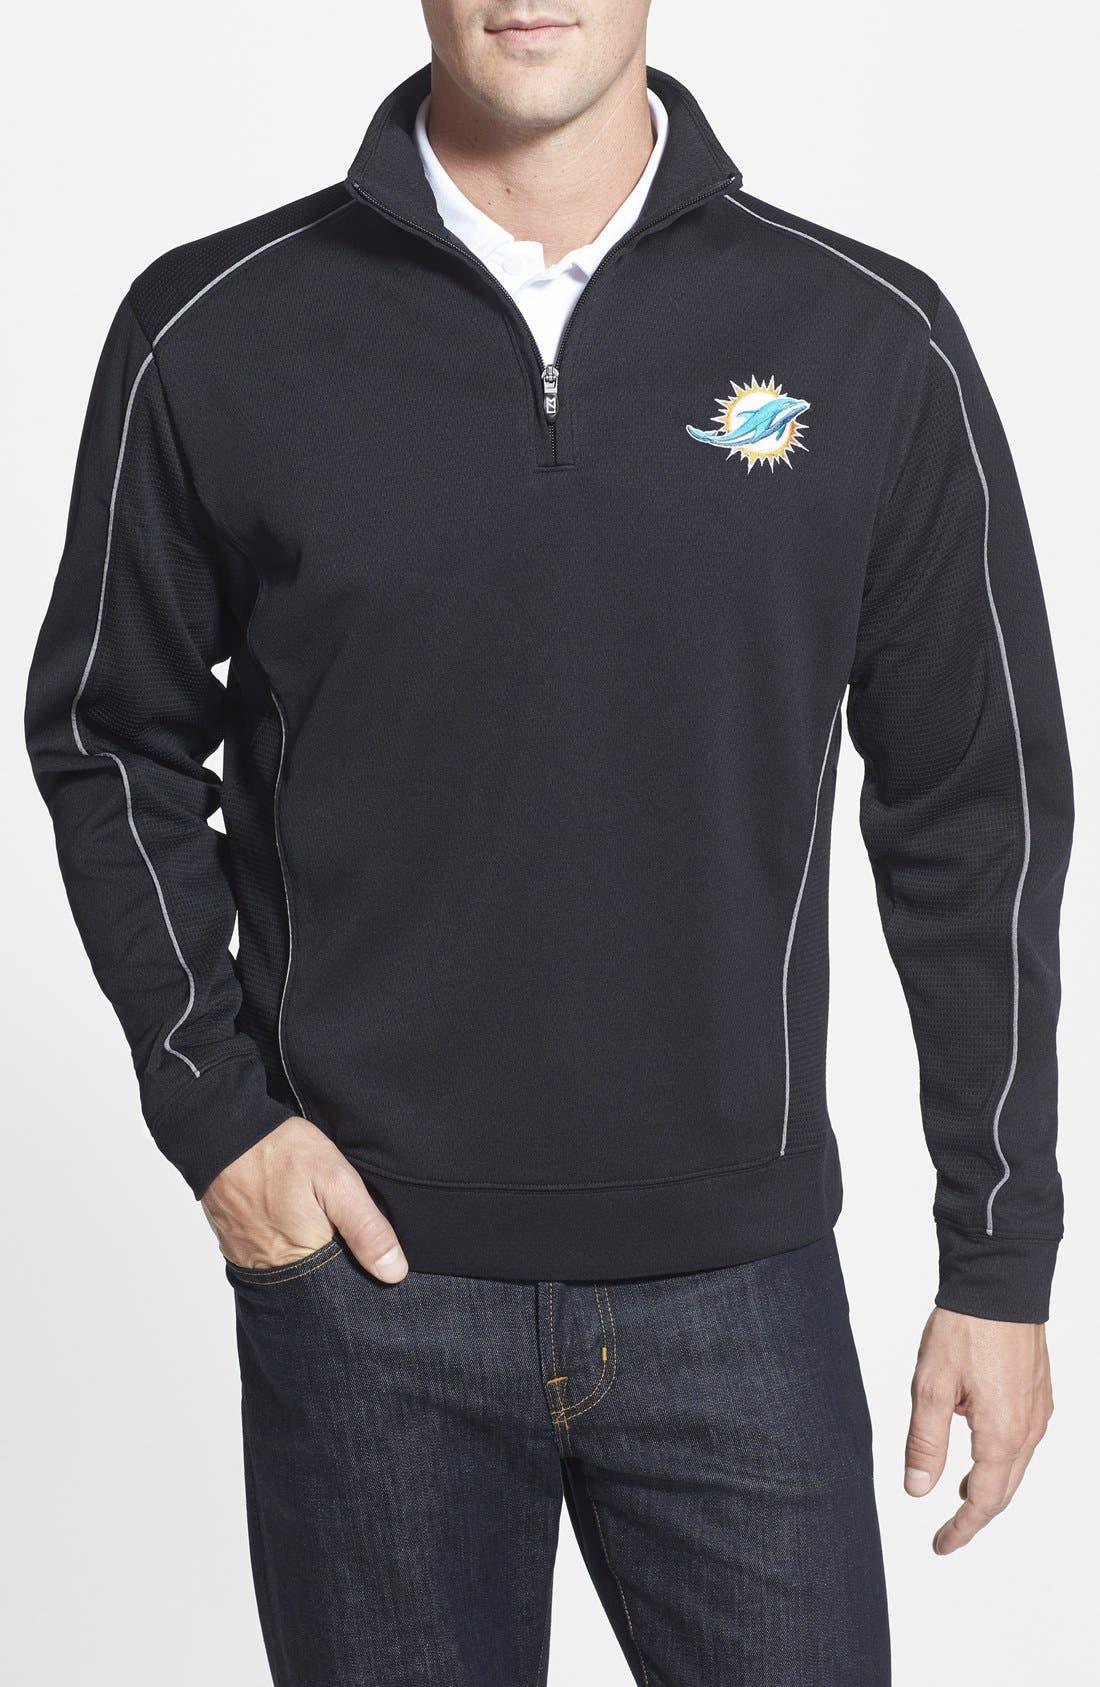 Miami Dolphins - Edge DryTec Moisture Wicking Half Zip Pullover,                             Main thumbnail 1, color,                             001